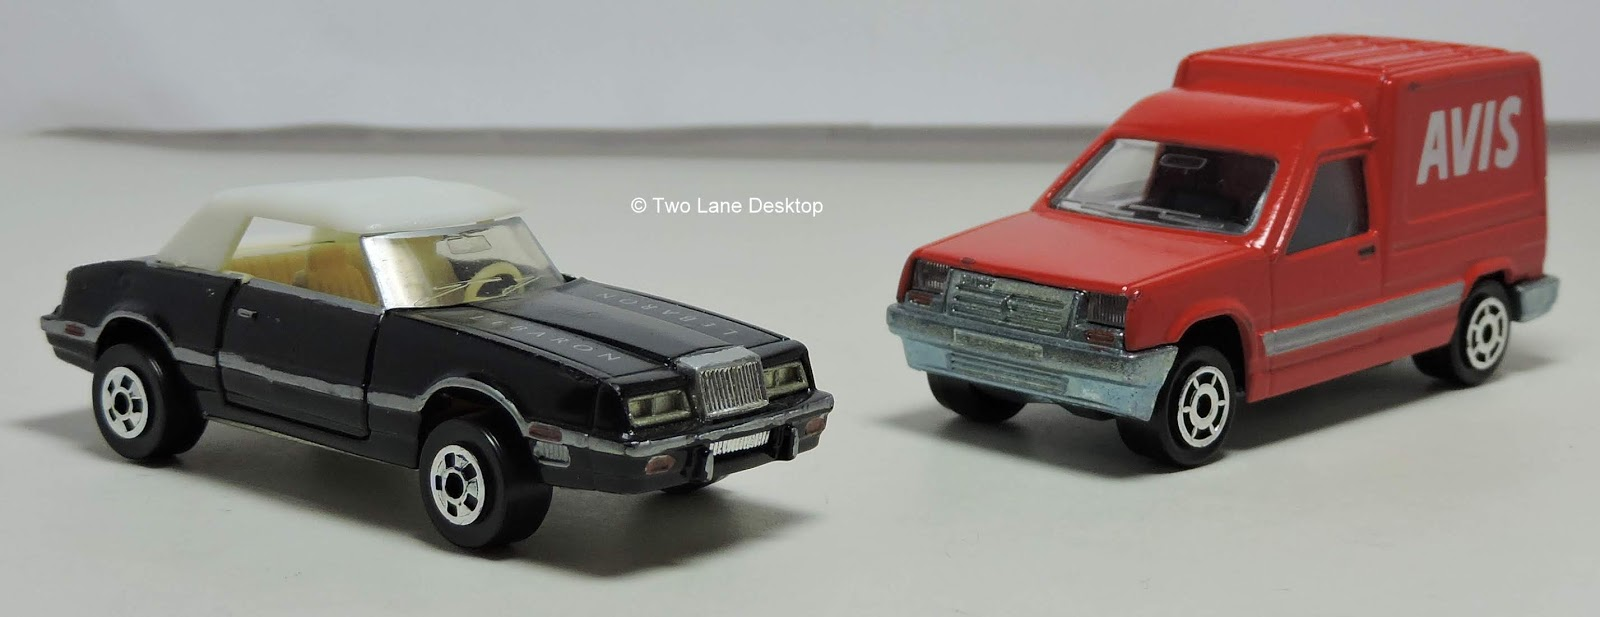 Majorette Renault Express and Road Champs Chrysler Lebaron ...